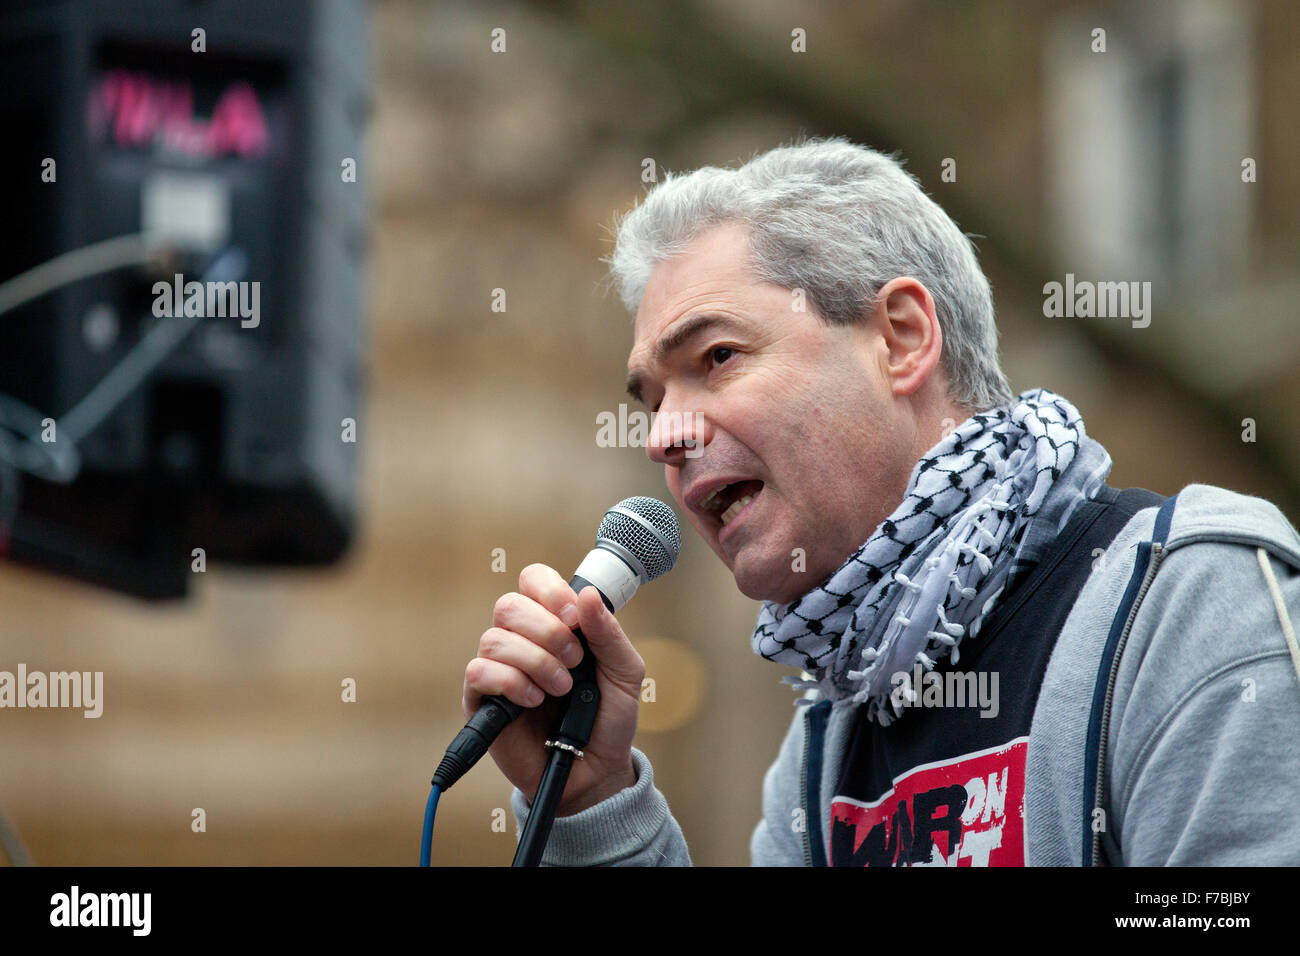 Londres, Reino Unido. 28 de noviembre de 2015. John Hilary, Director Ejecutivo de War on Want, aborda la protesta Imagen De Stock